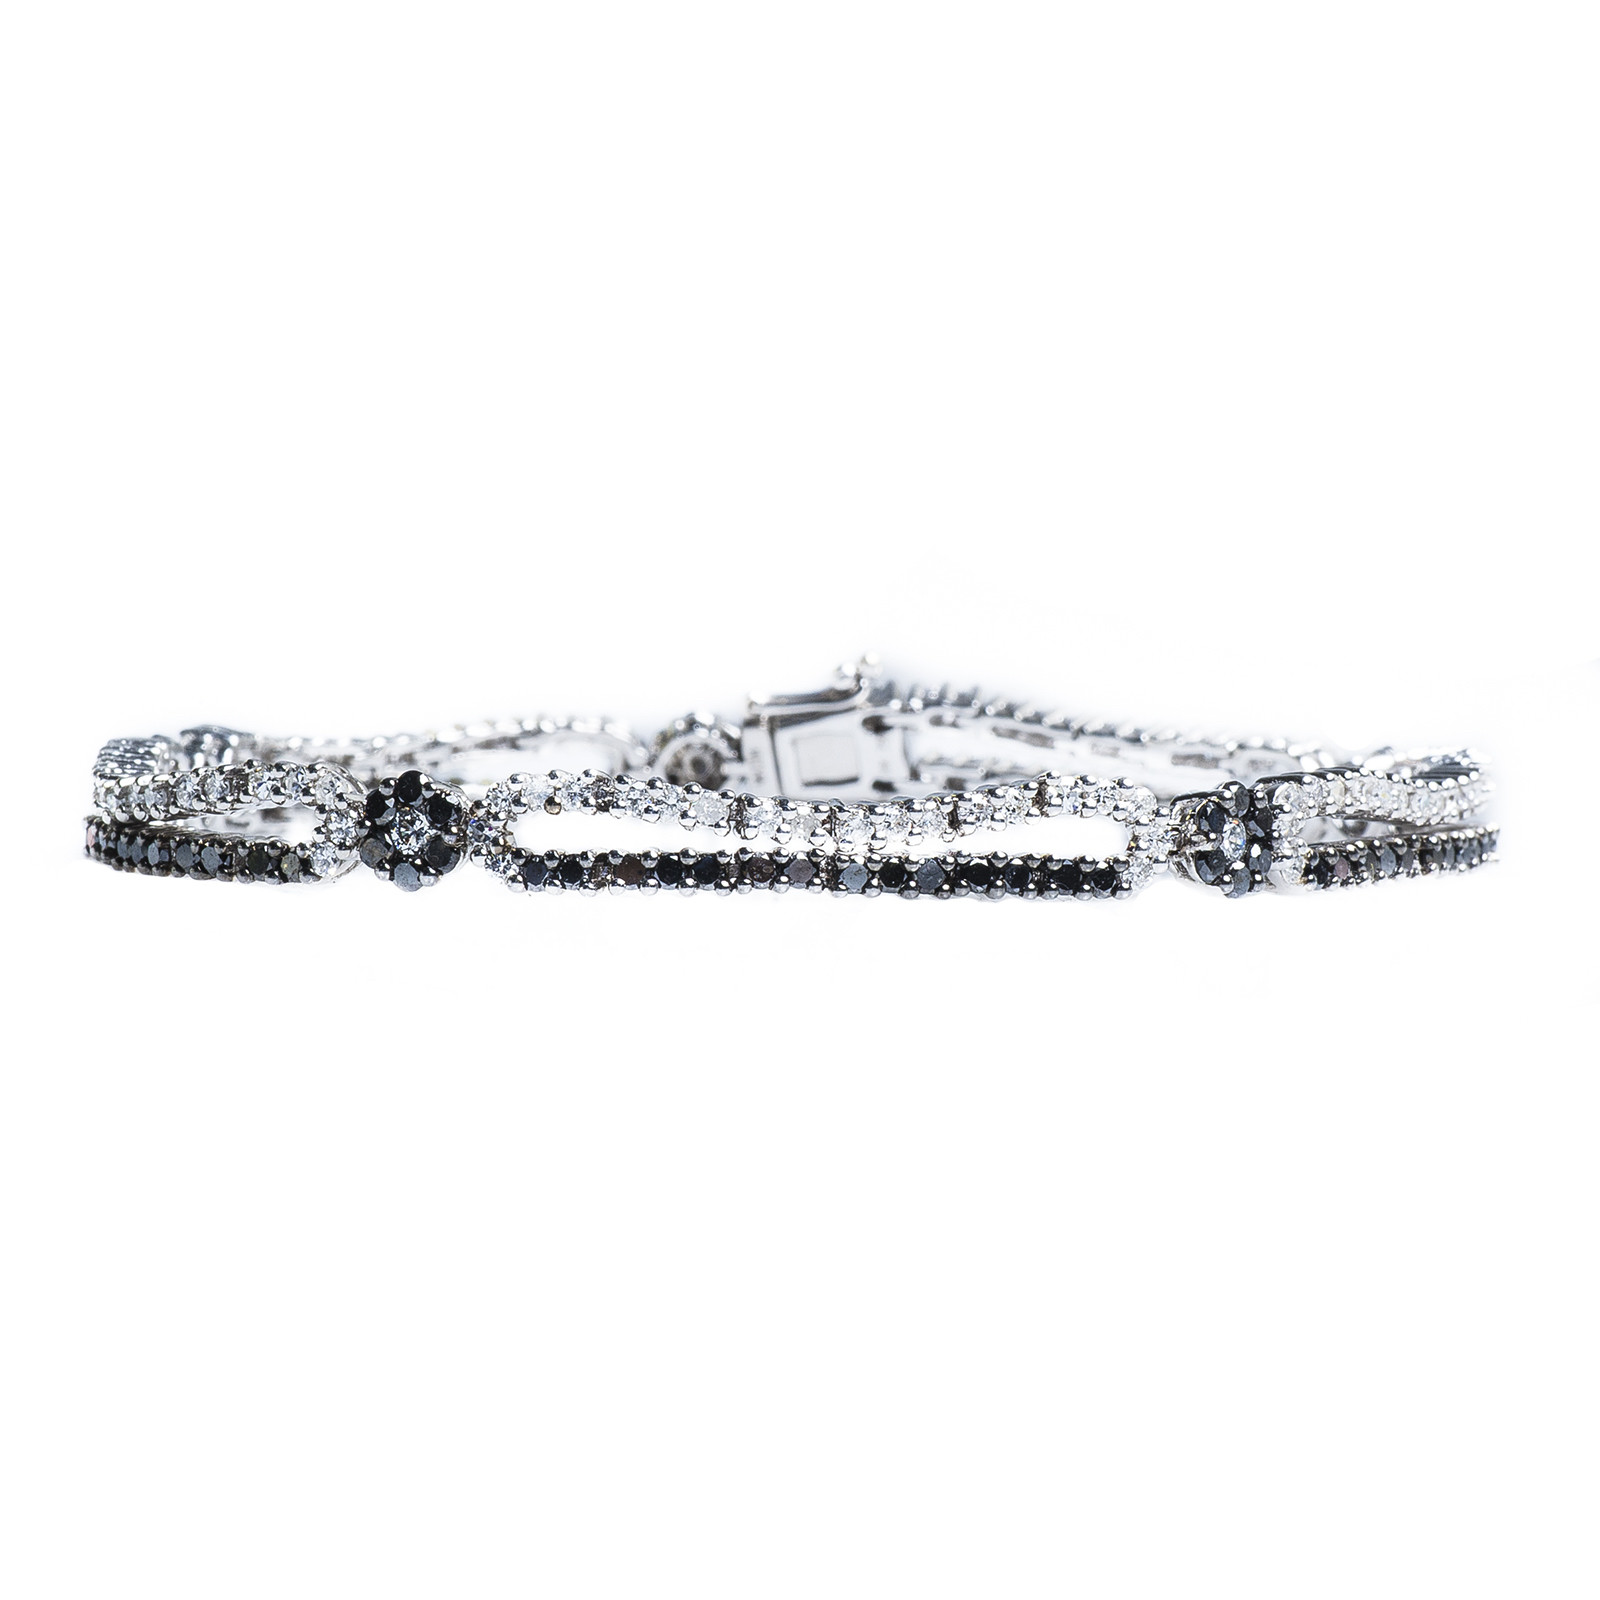 New 4.82 CTW White & Diamond Tennis Bracelet